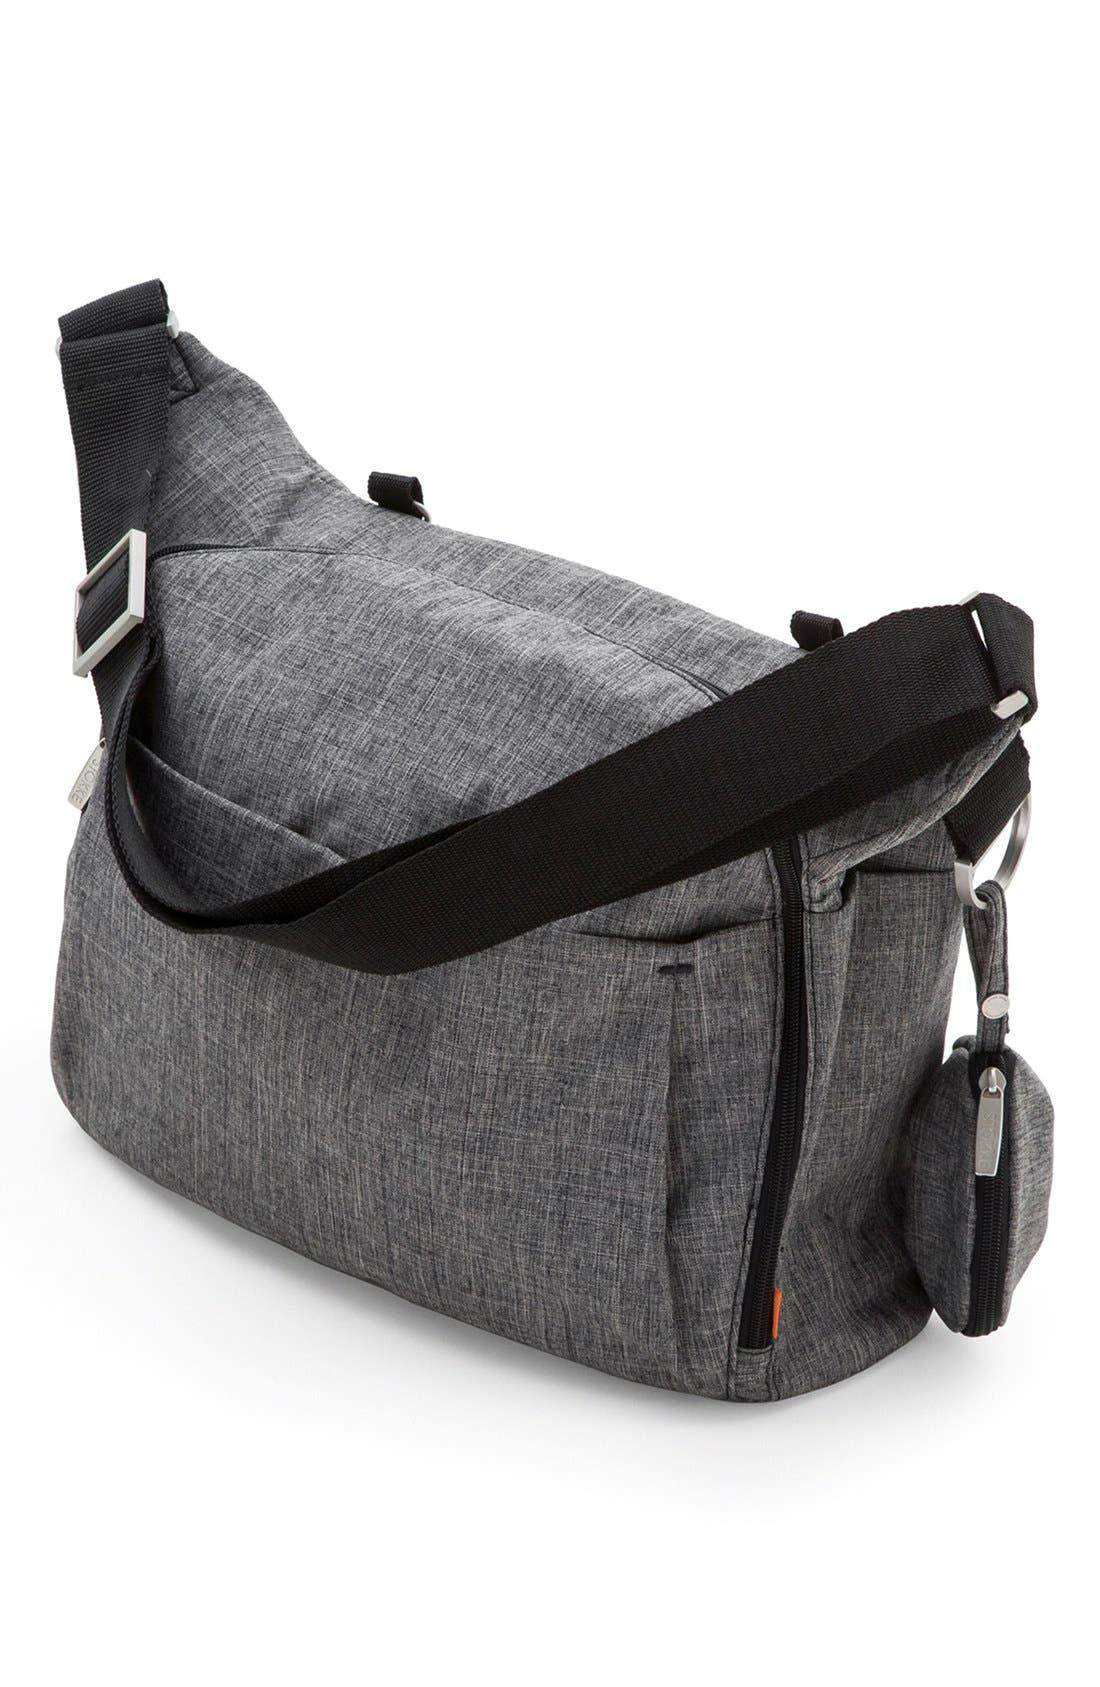 Baby 'Xplory<sup>®</sup>' Changing Bag,                         Main,                         color, 002